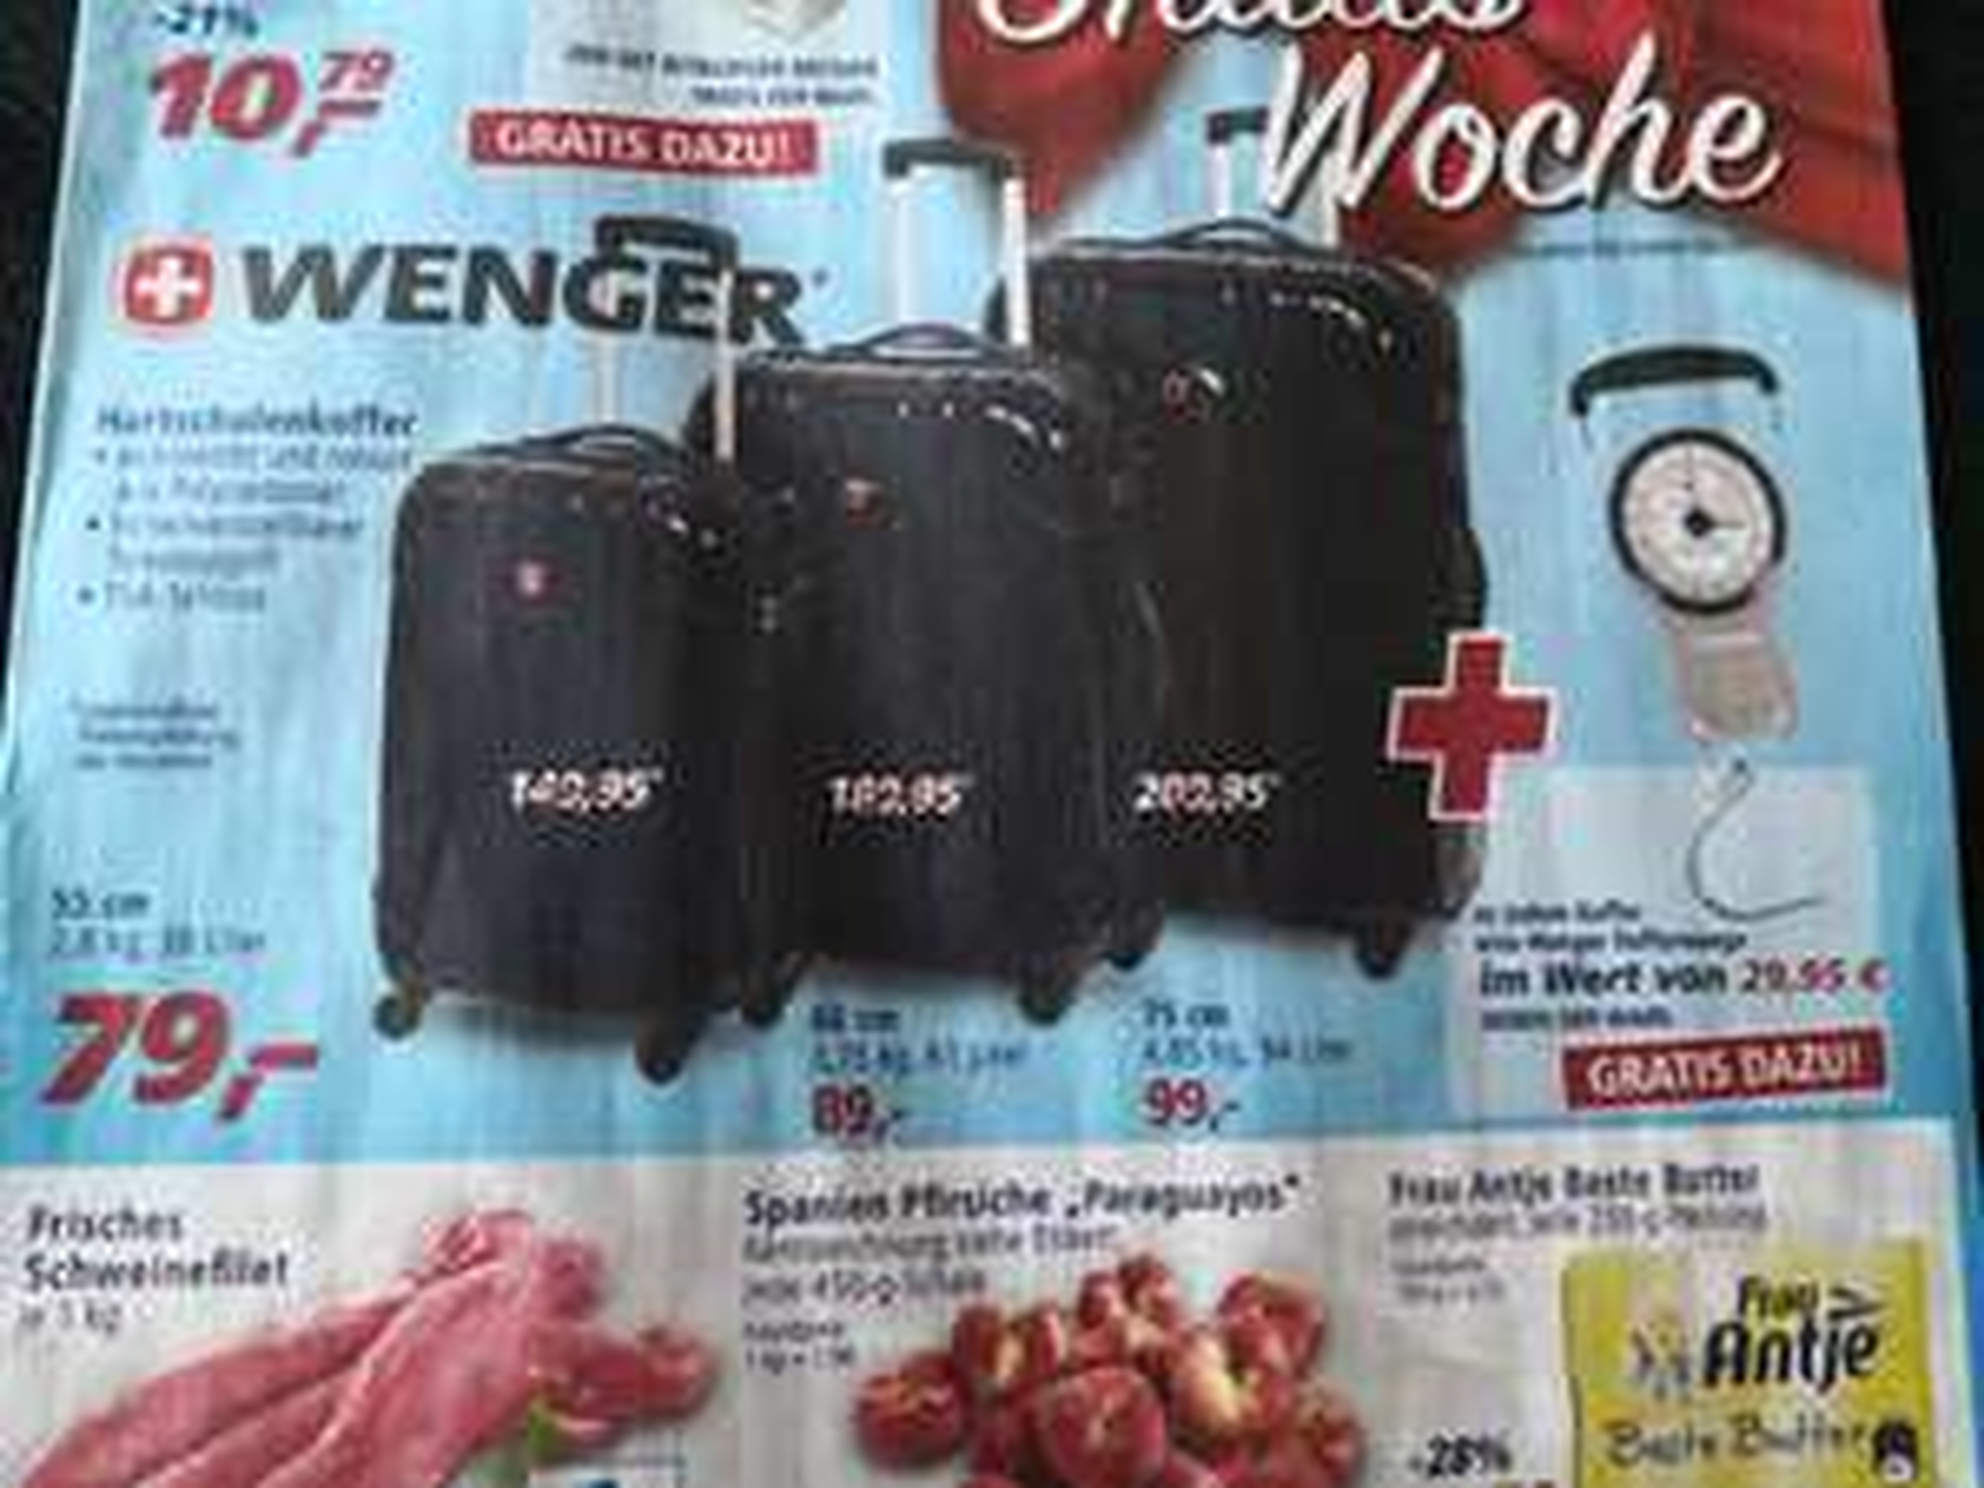 Wenger Swissgear By Wenger Evo Lite 4-Rollen Kabinen-Trolley 55 Cm W7203 22 21 Schwarz inkl. Wenger Kofferwaage mit Maßband 50006306